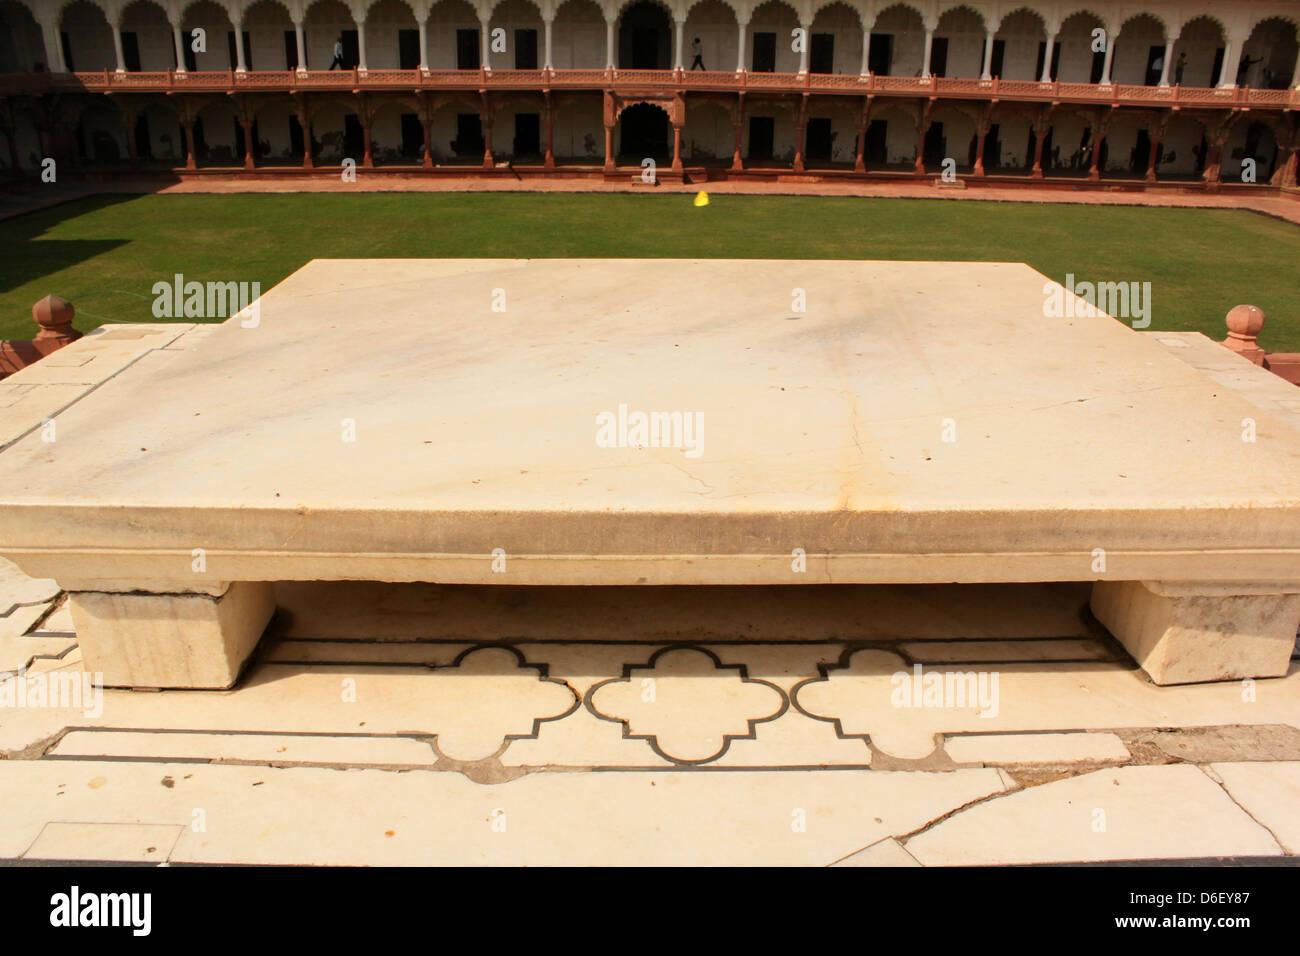 Shah Jahan 's throne Agra Fort  UNESCO World Heritage site Agra, Uttar Pradesh, India Stock Photo